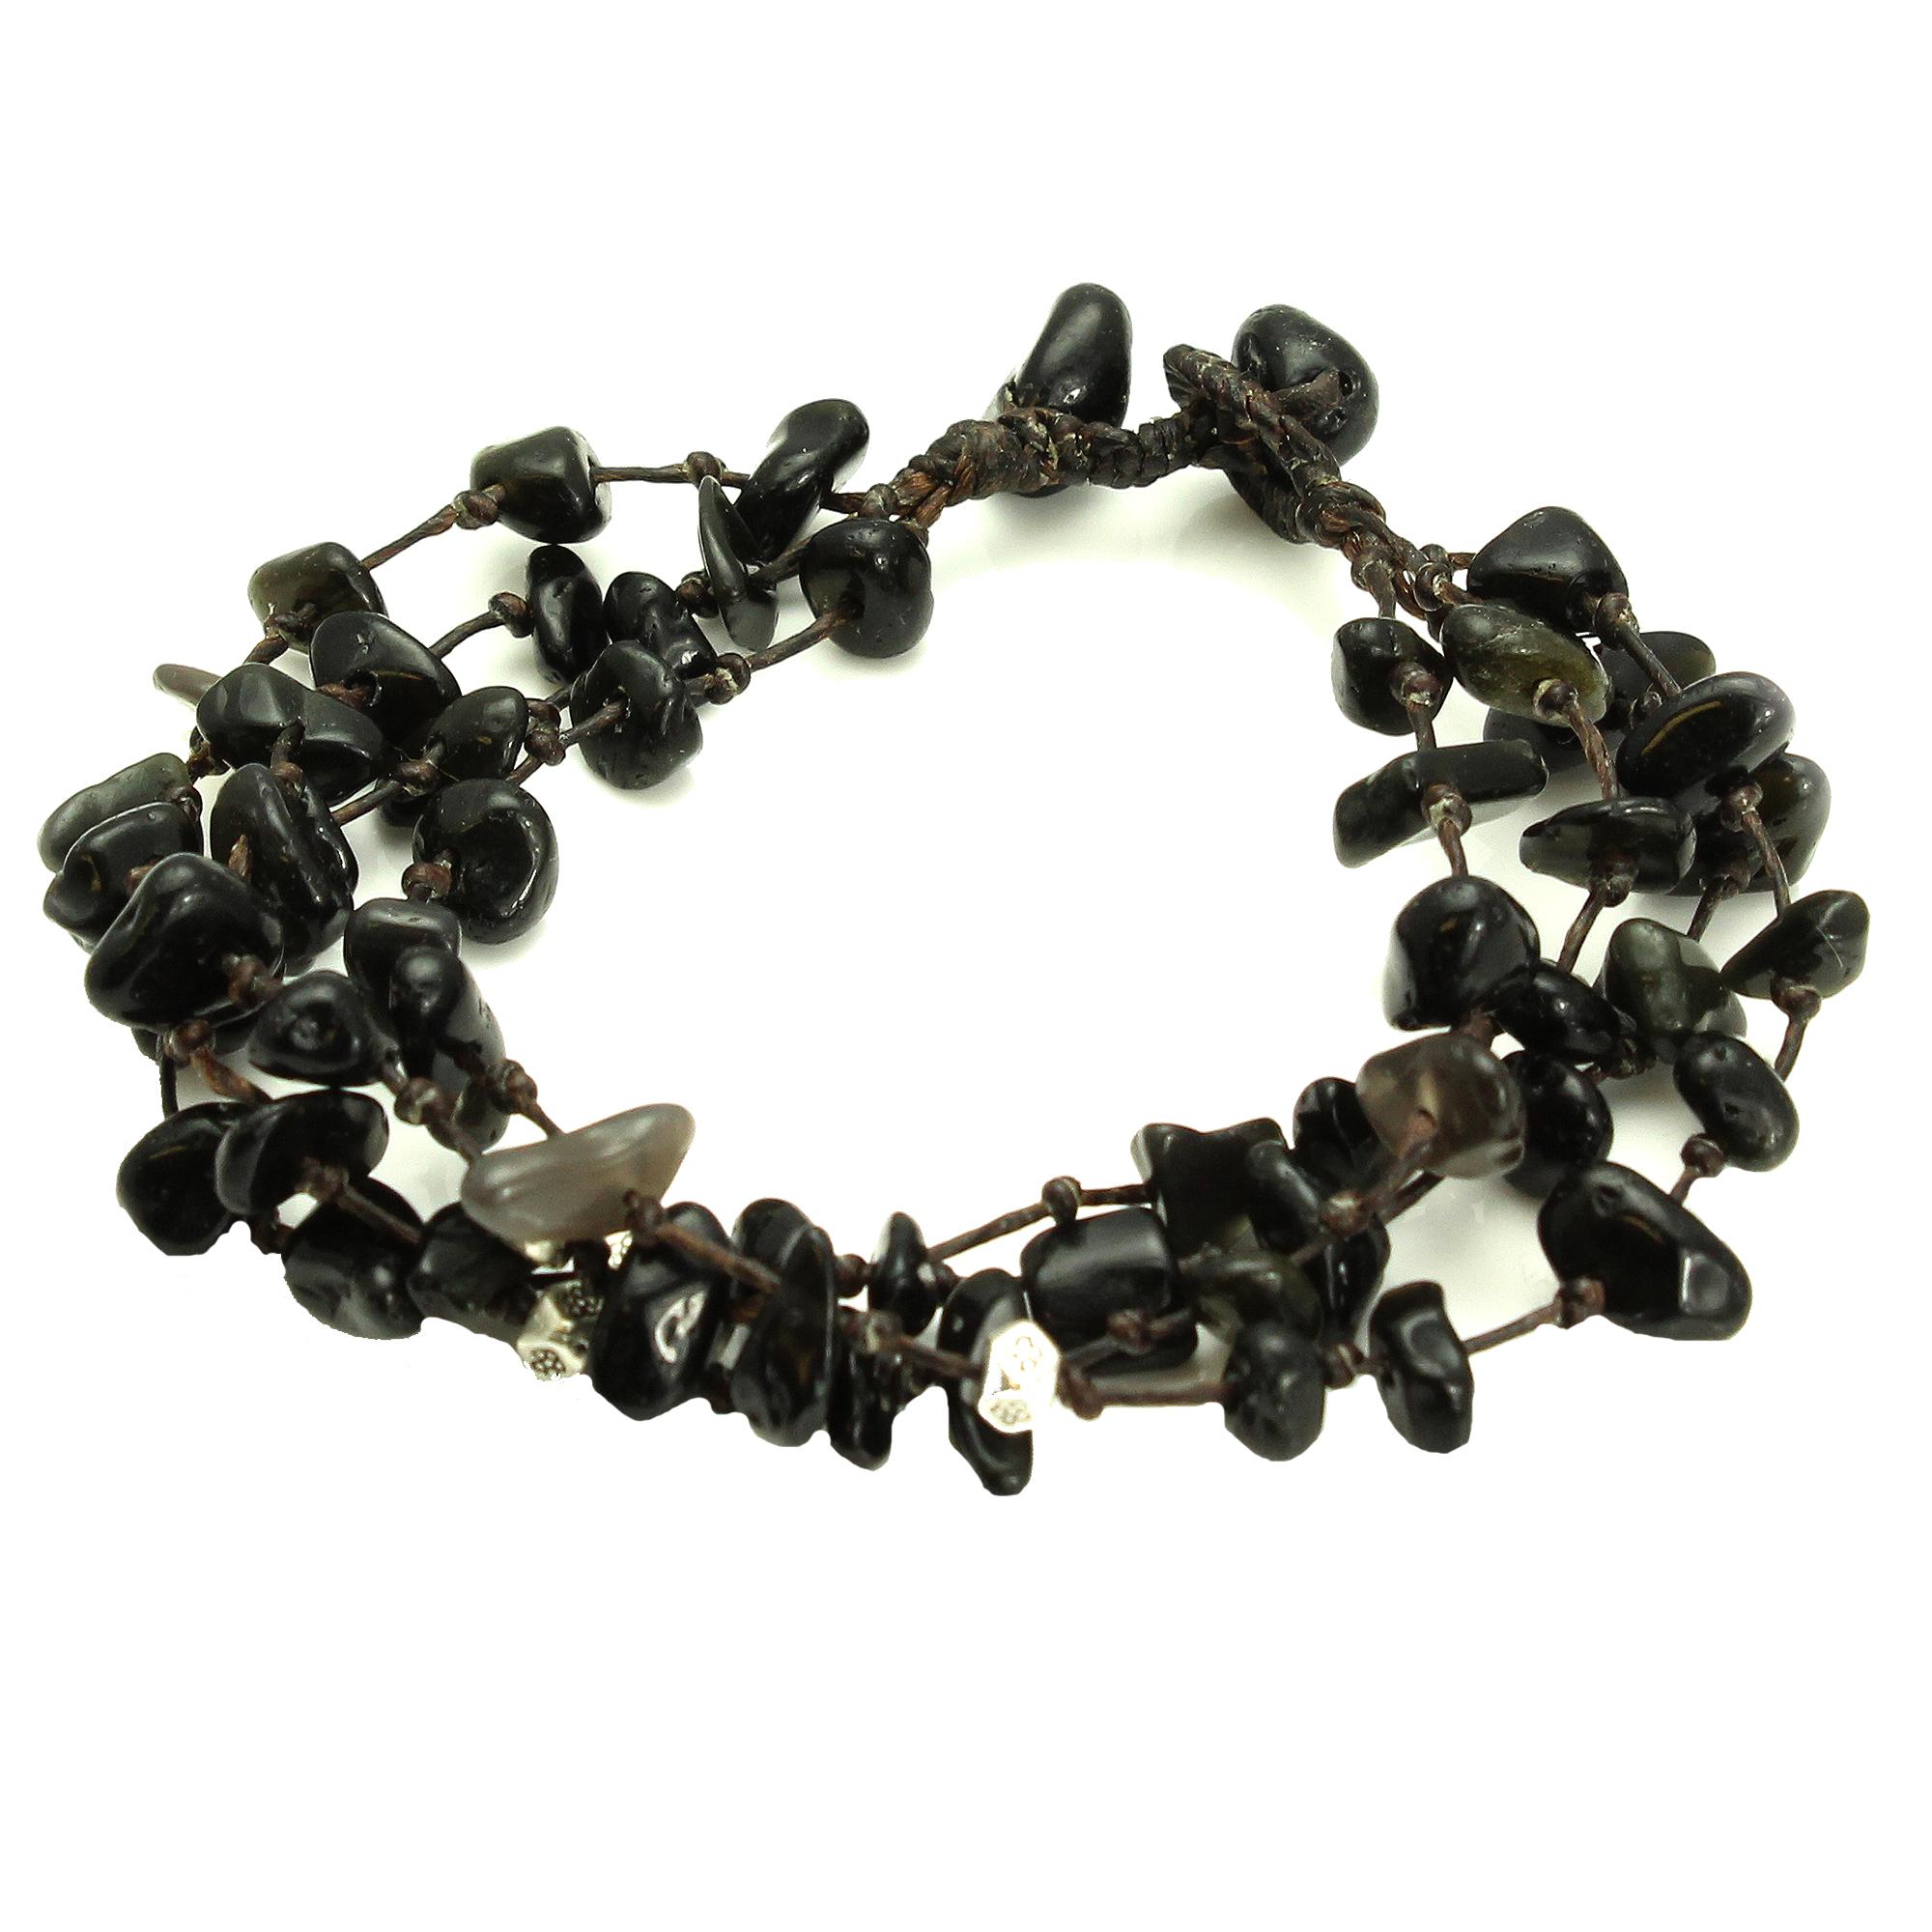 Adjustable Four Strand Black Stone Bead Bracelet, Handmade Fair Trade